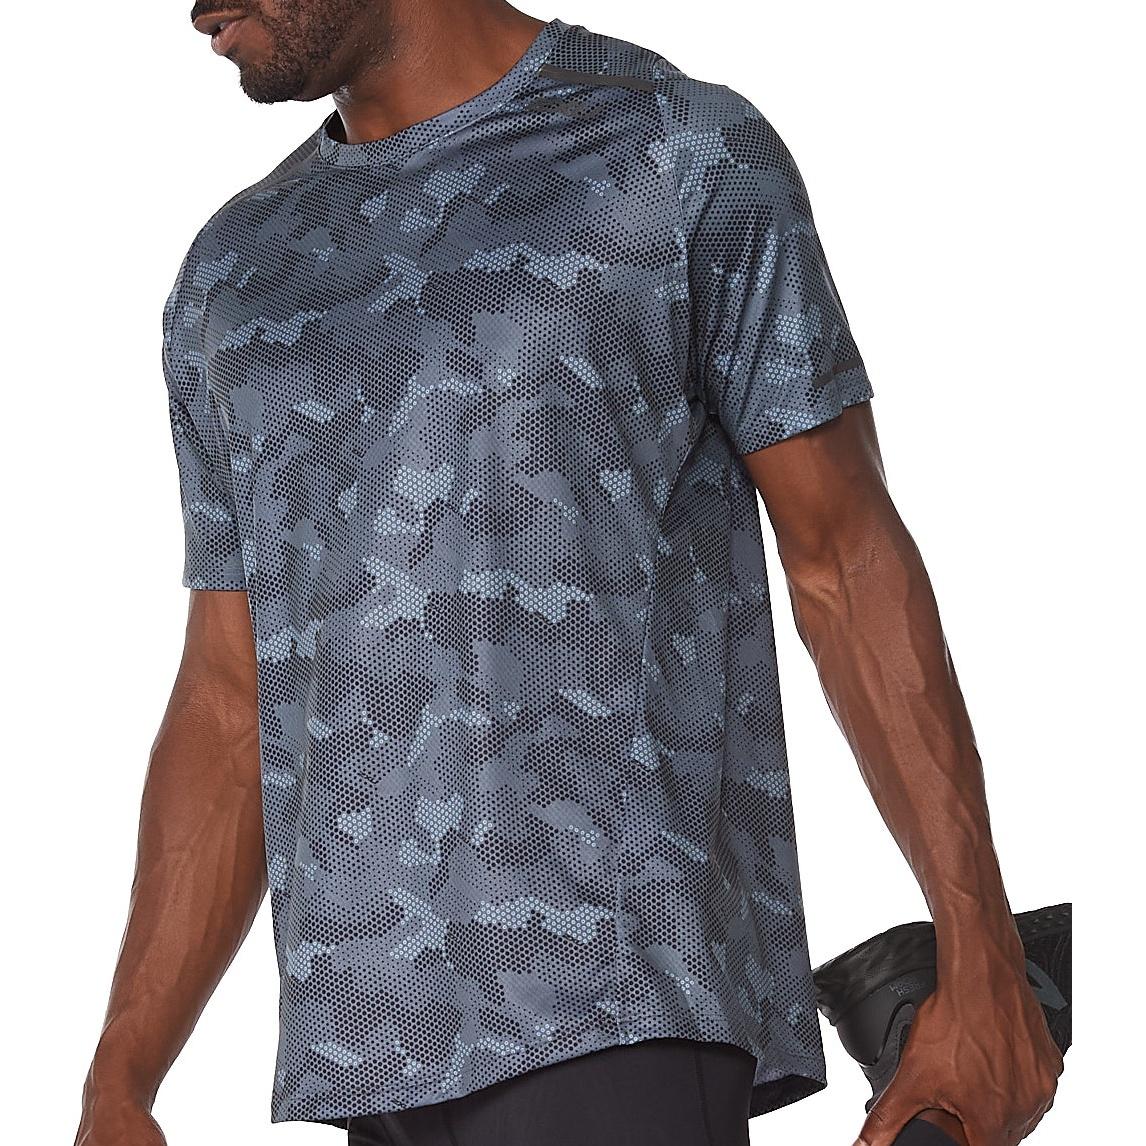 Imagen de 2XU Light Speed Camiseta - division camo/black reflective